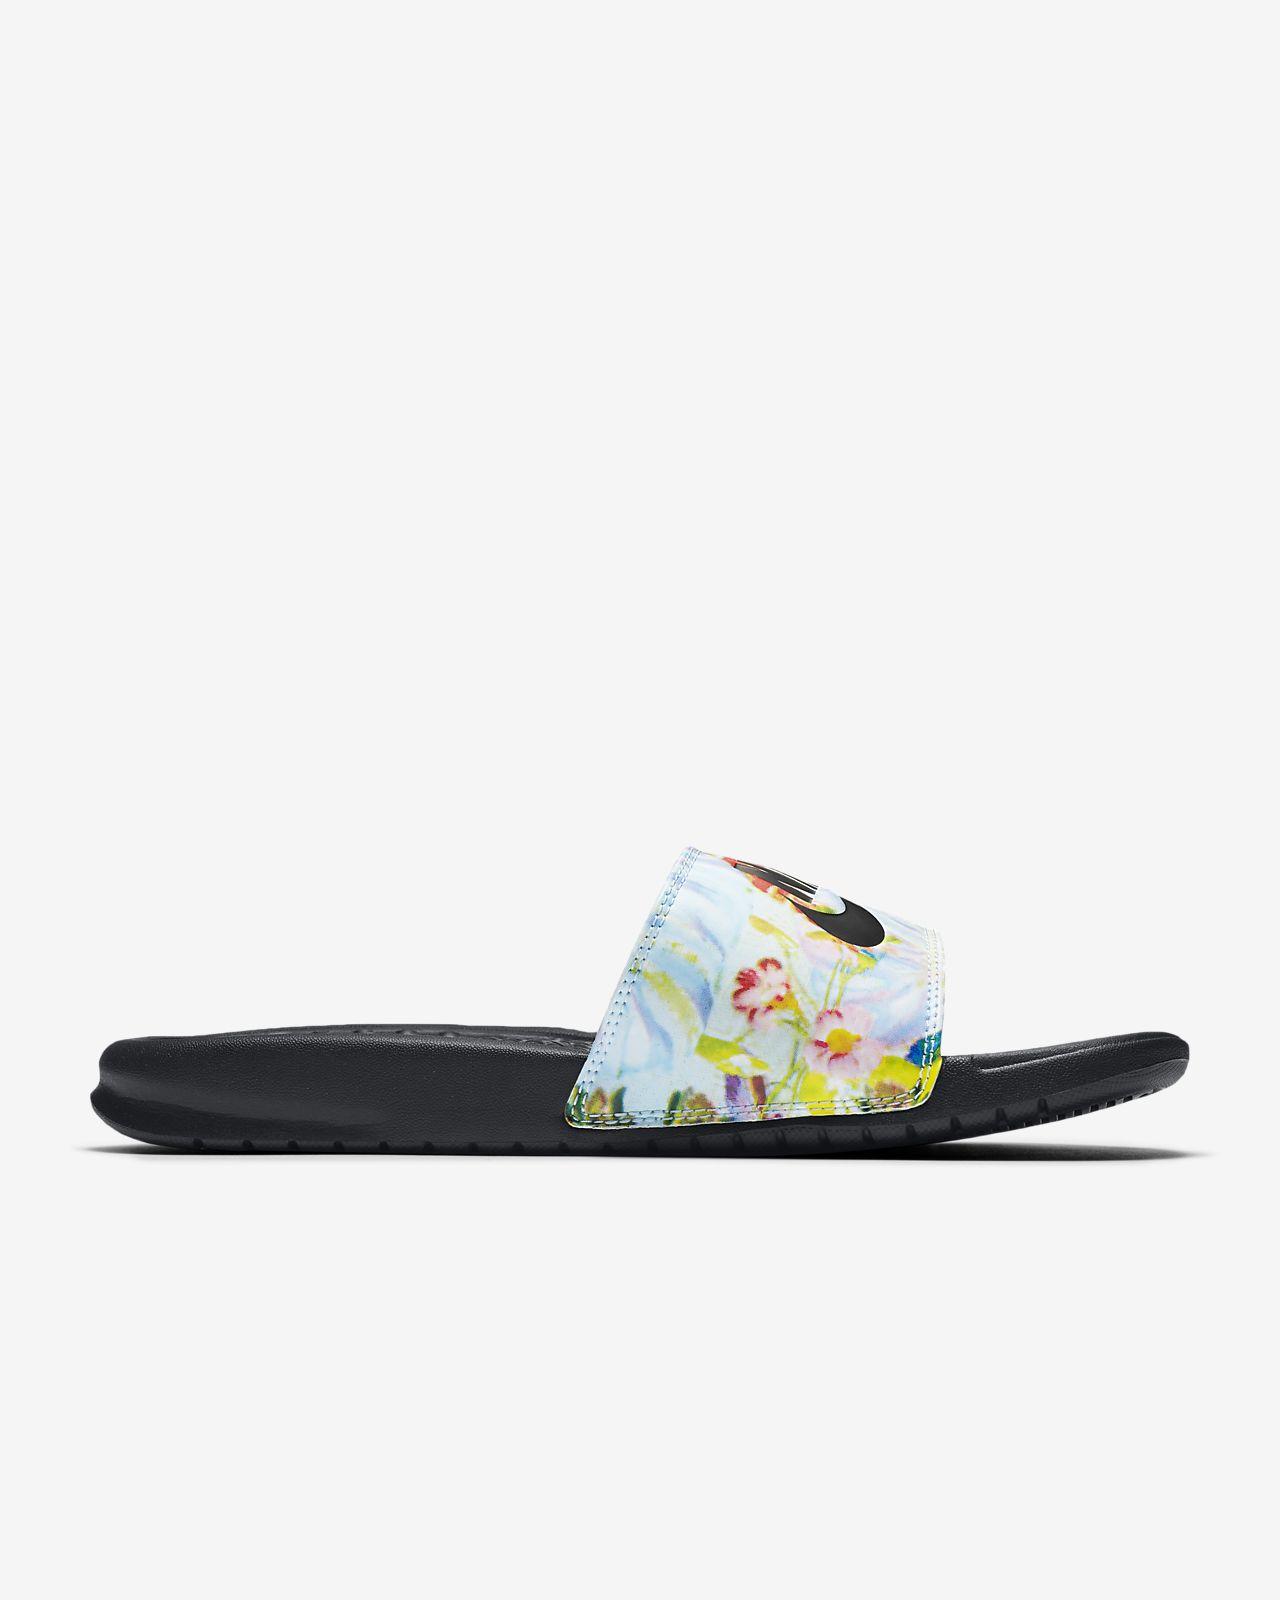 Nike Benassi Jdi Floral Women S Slide Nike Lu